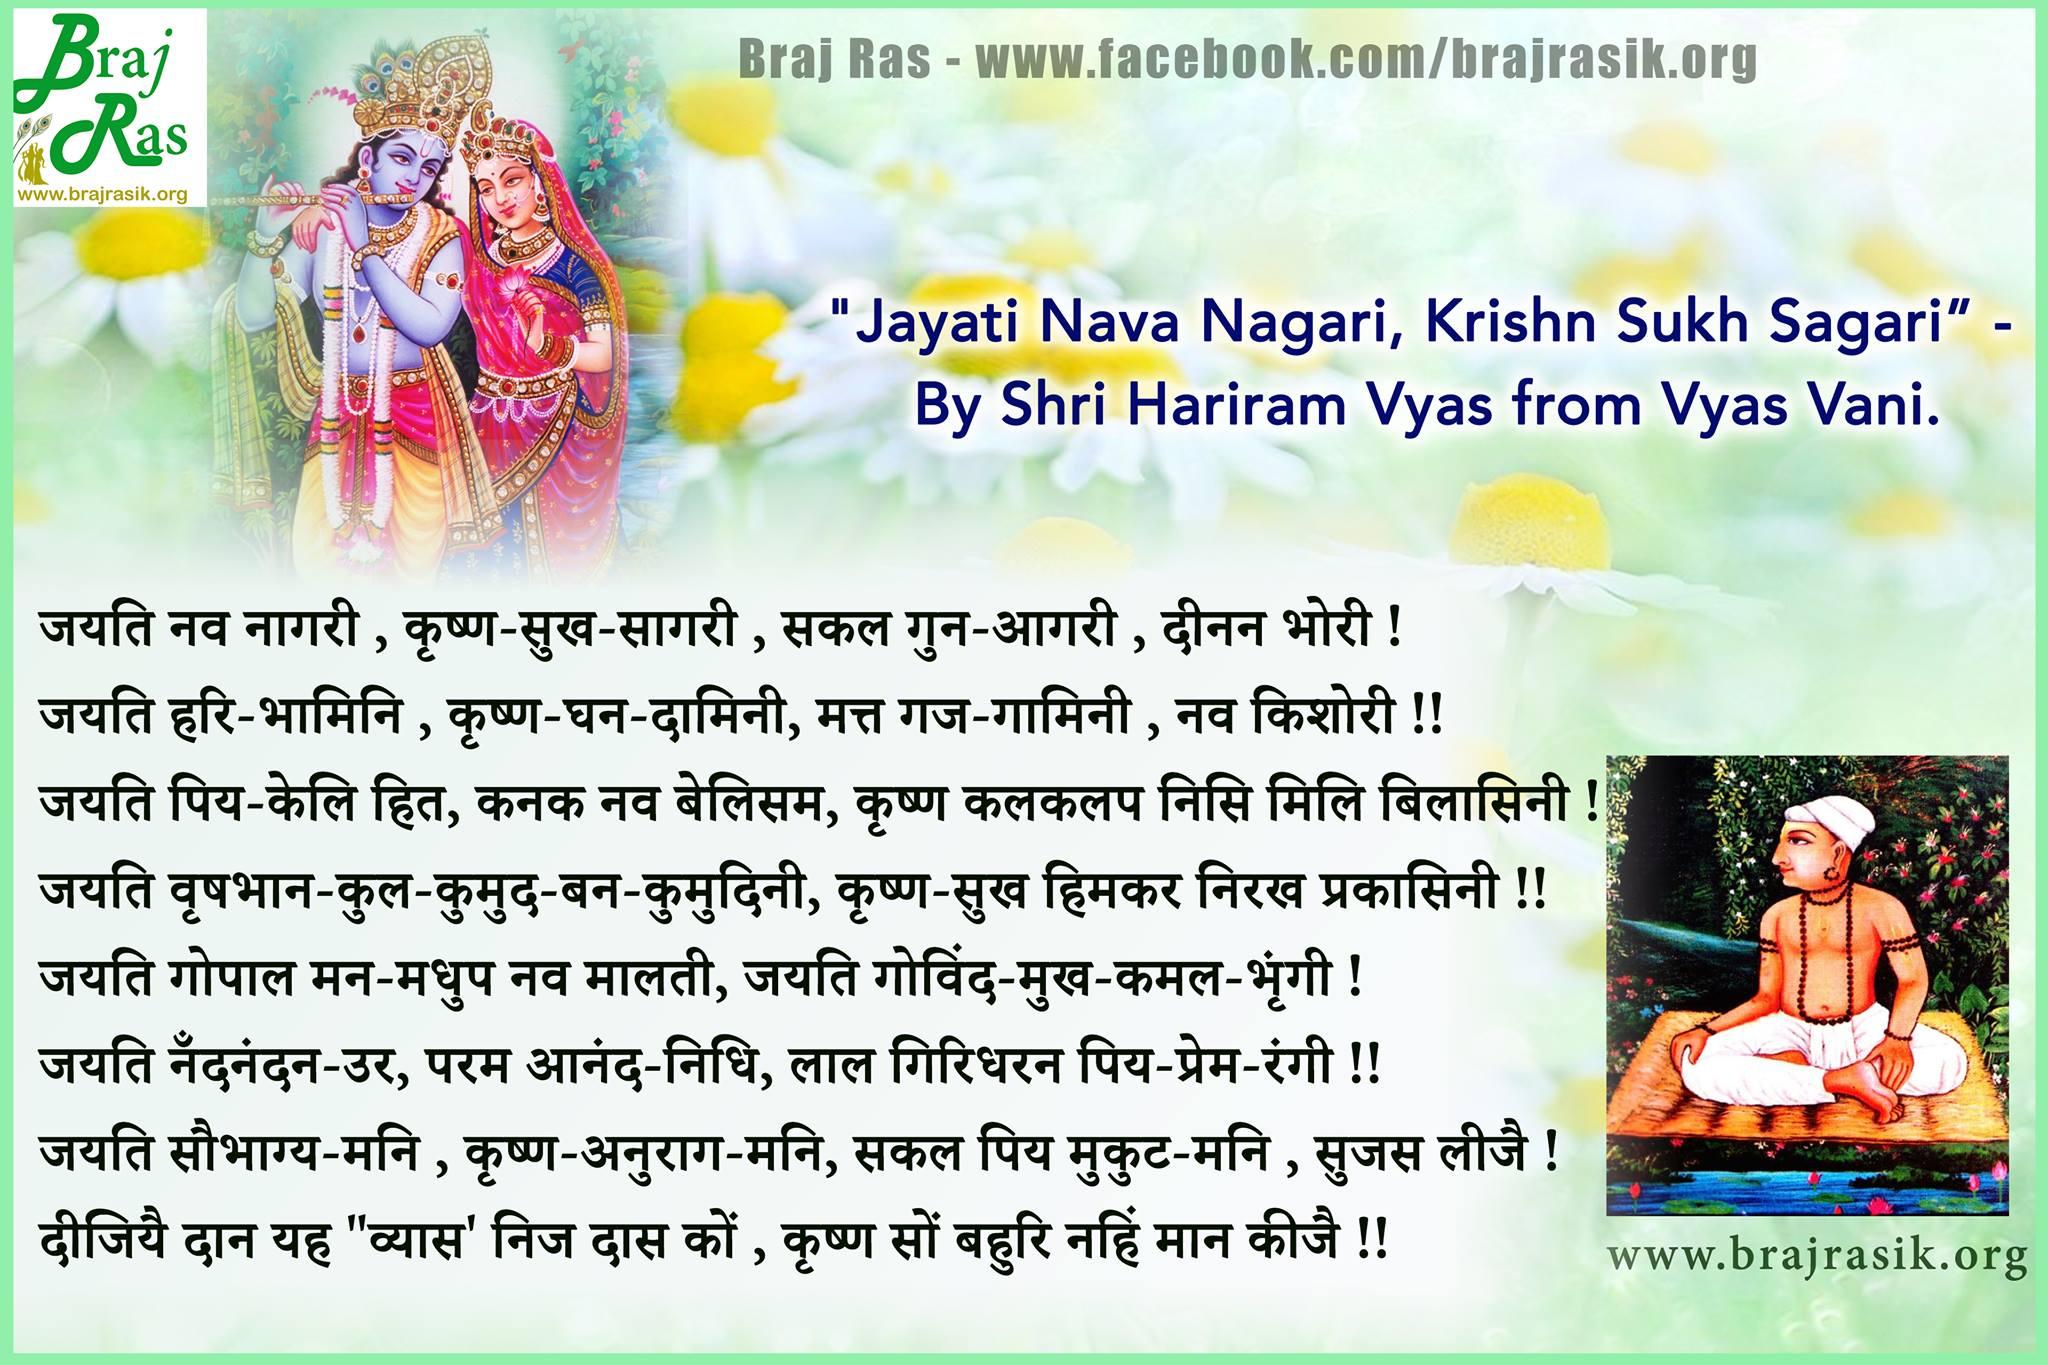 """Jayati Nava Nagari, Krishn Sukh Sagari"" - By Shri Hariram Vyas from Vyas Vani."